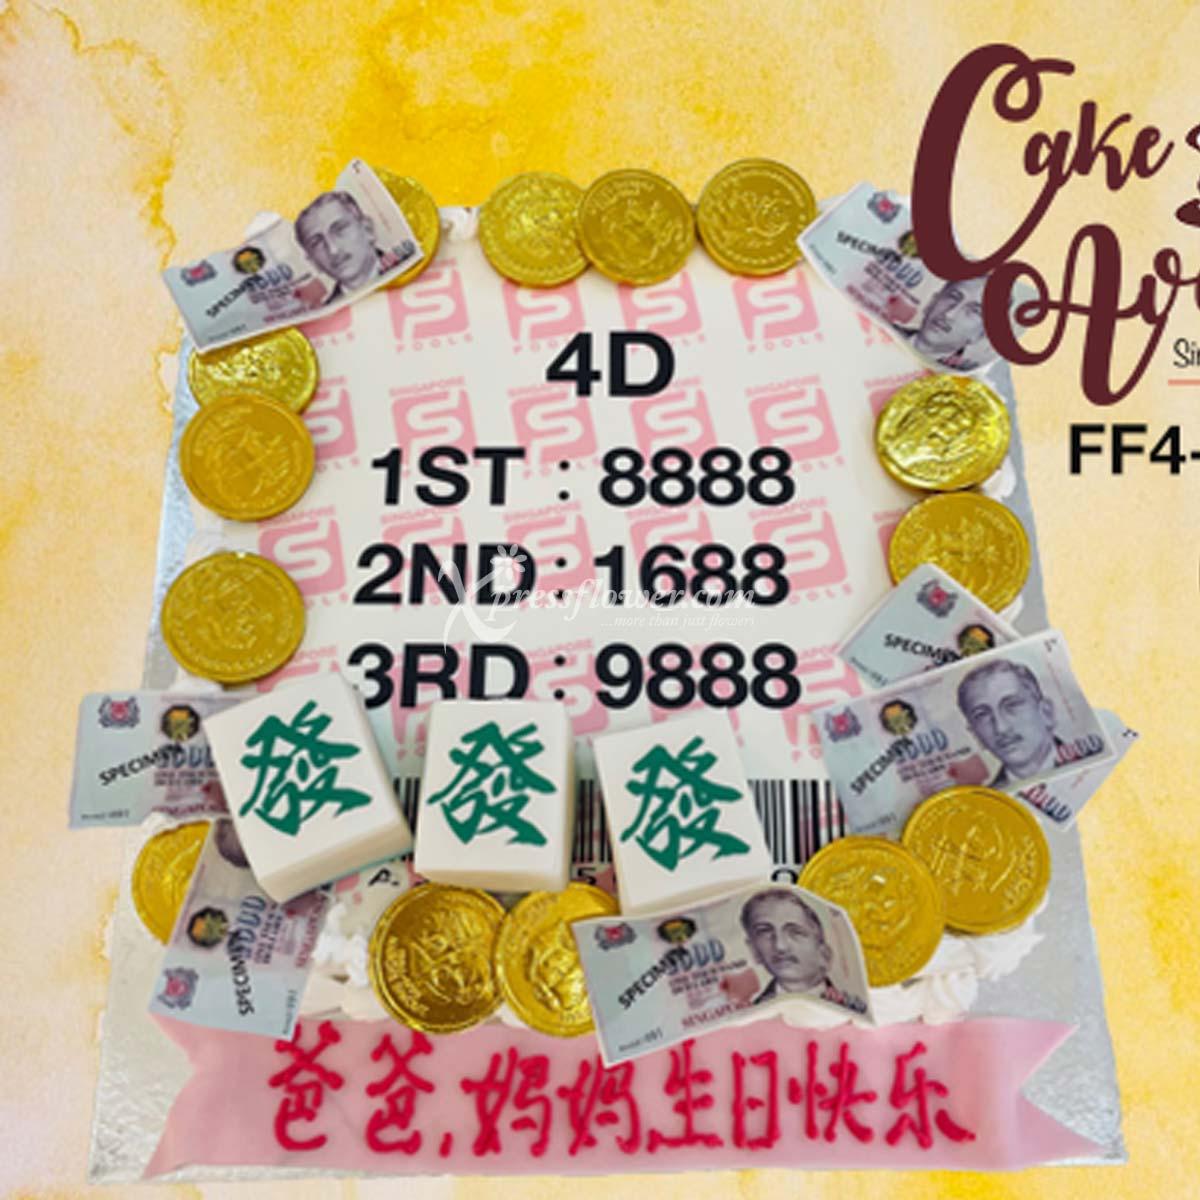 CAC2111 4D Ticket B